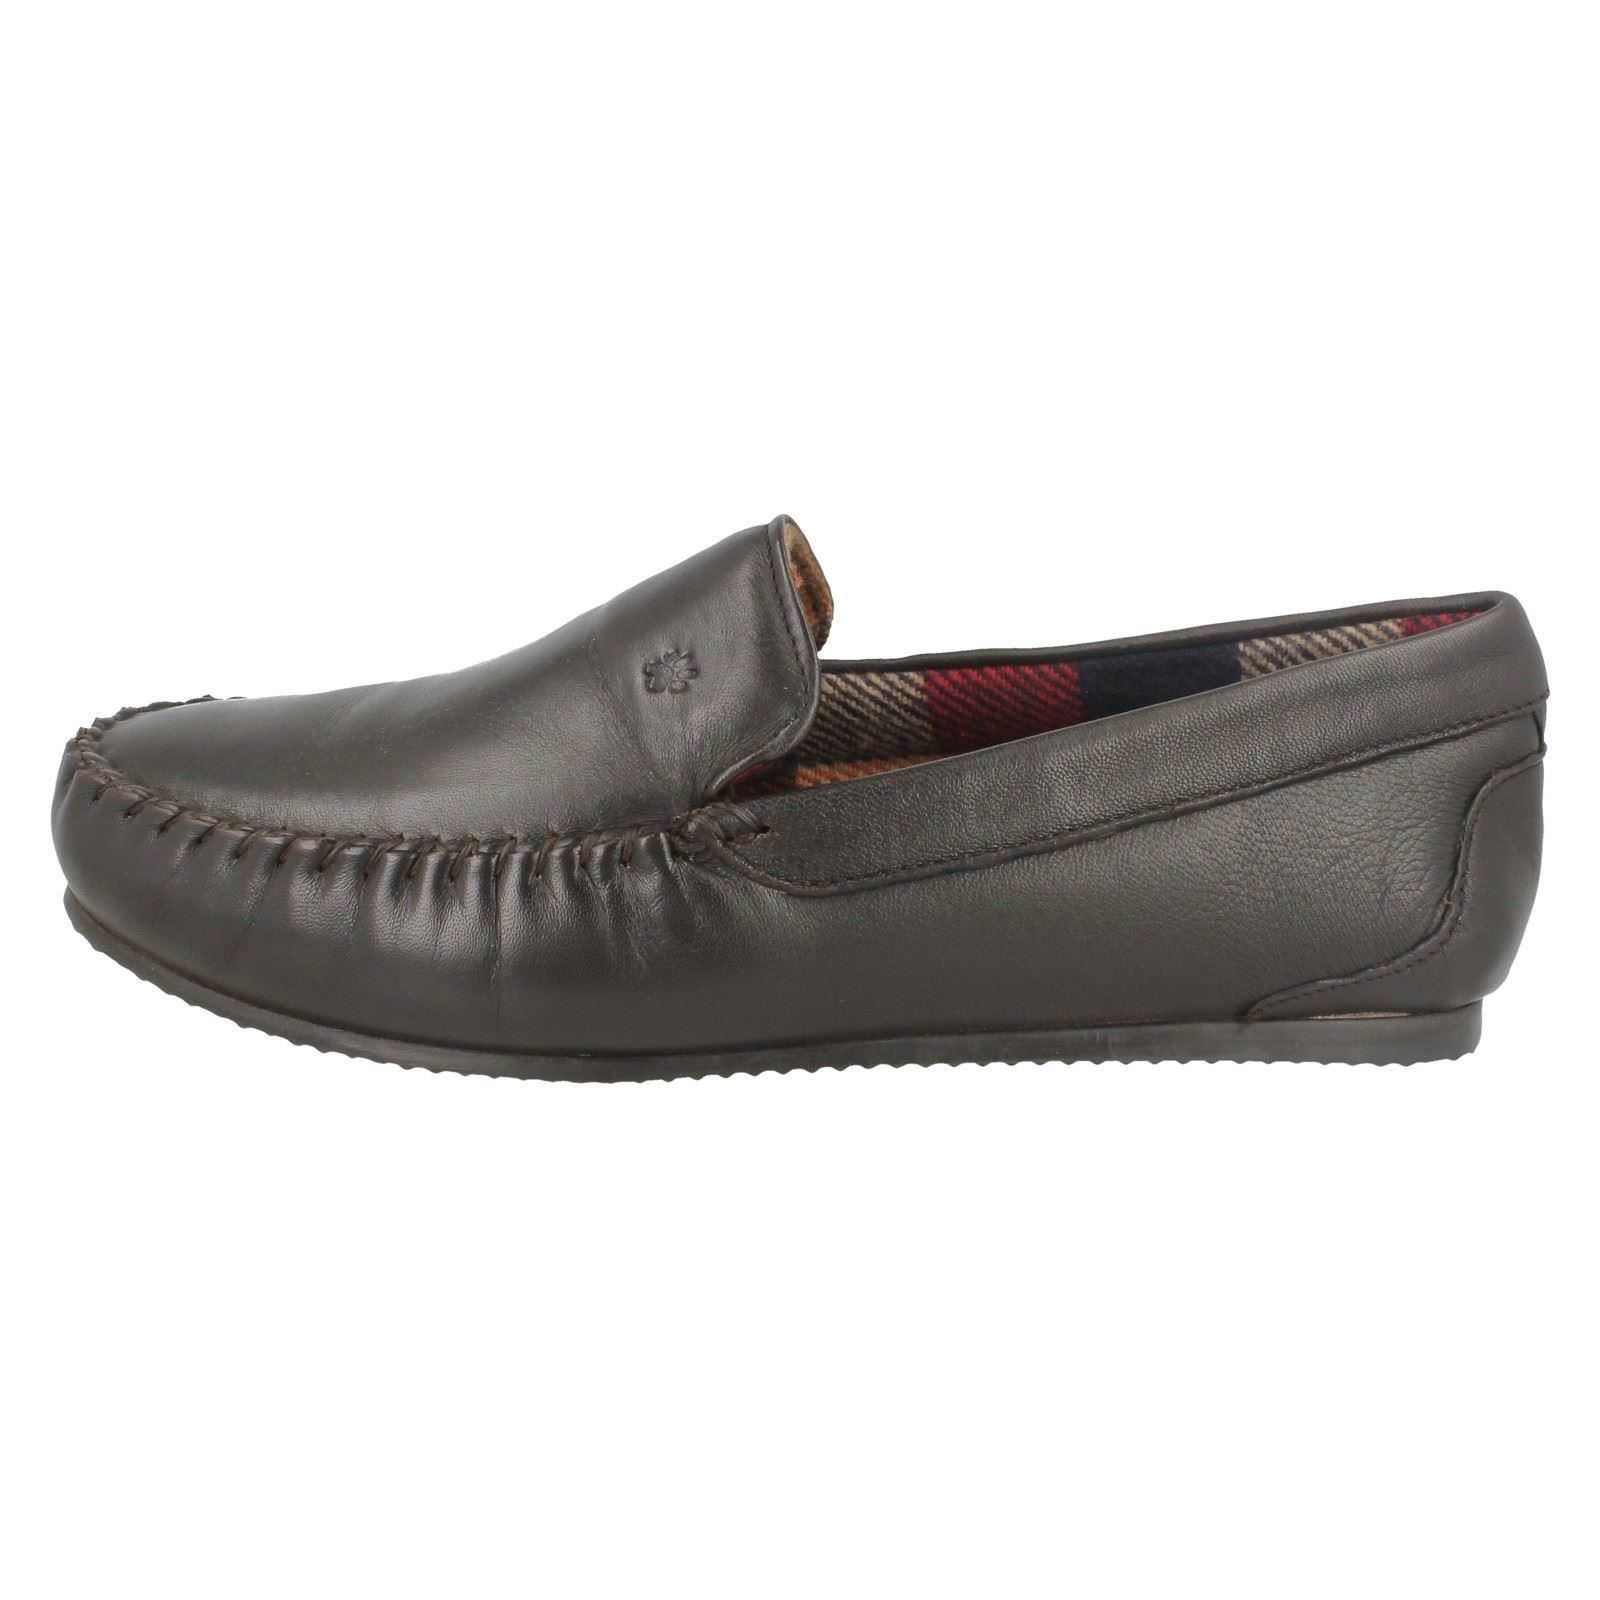 Pantofole Lo da uomo Lo Pantofole stile mocassino da Uomo Padders Pantofole * marino * 9603f5